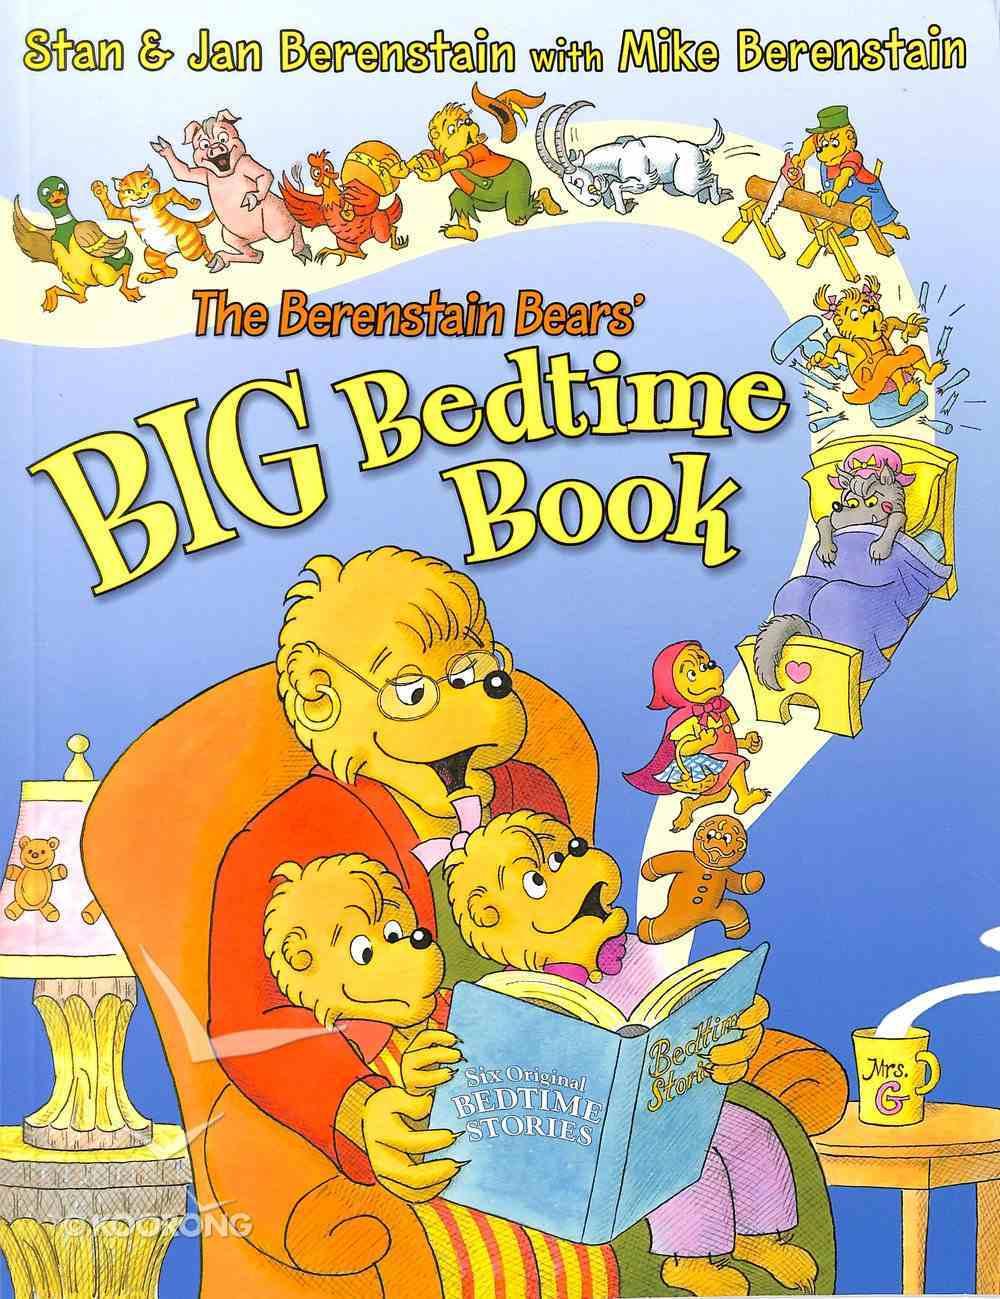 Big Bedtime Book (The Berenstain Bears Series) Paperback